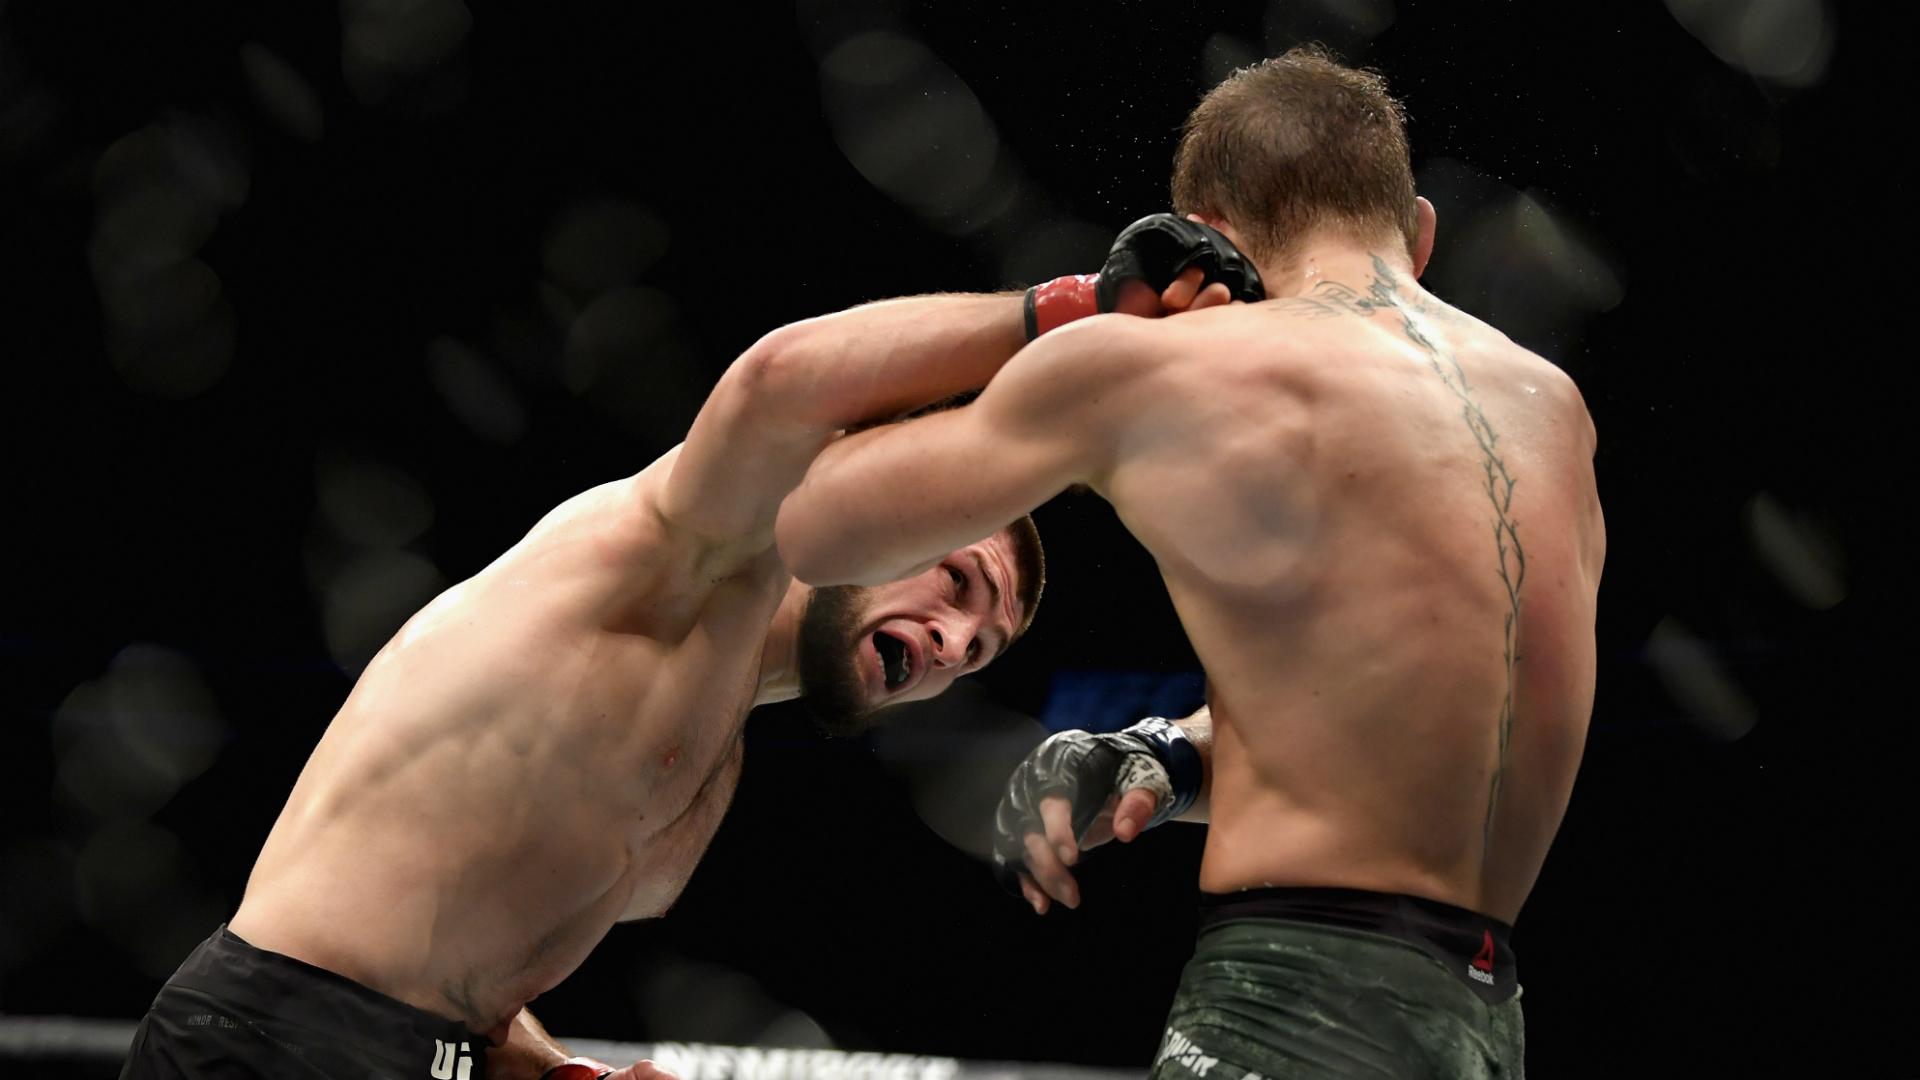 Conor McGregor, Khabib Nurmagomedov temporarily suspended for brawl, report says